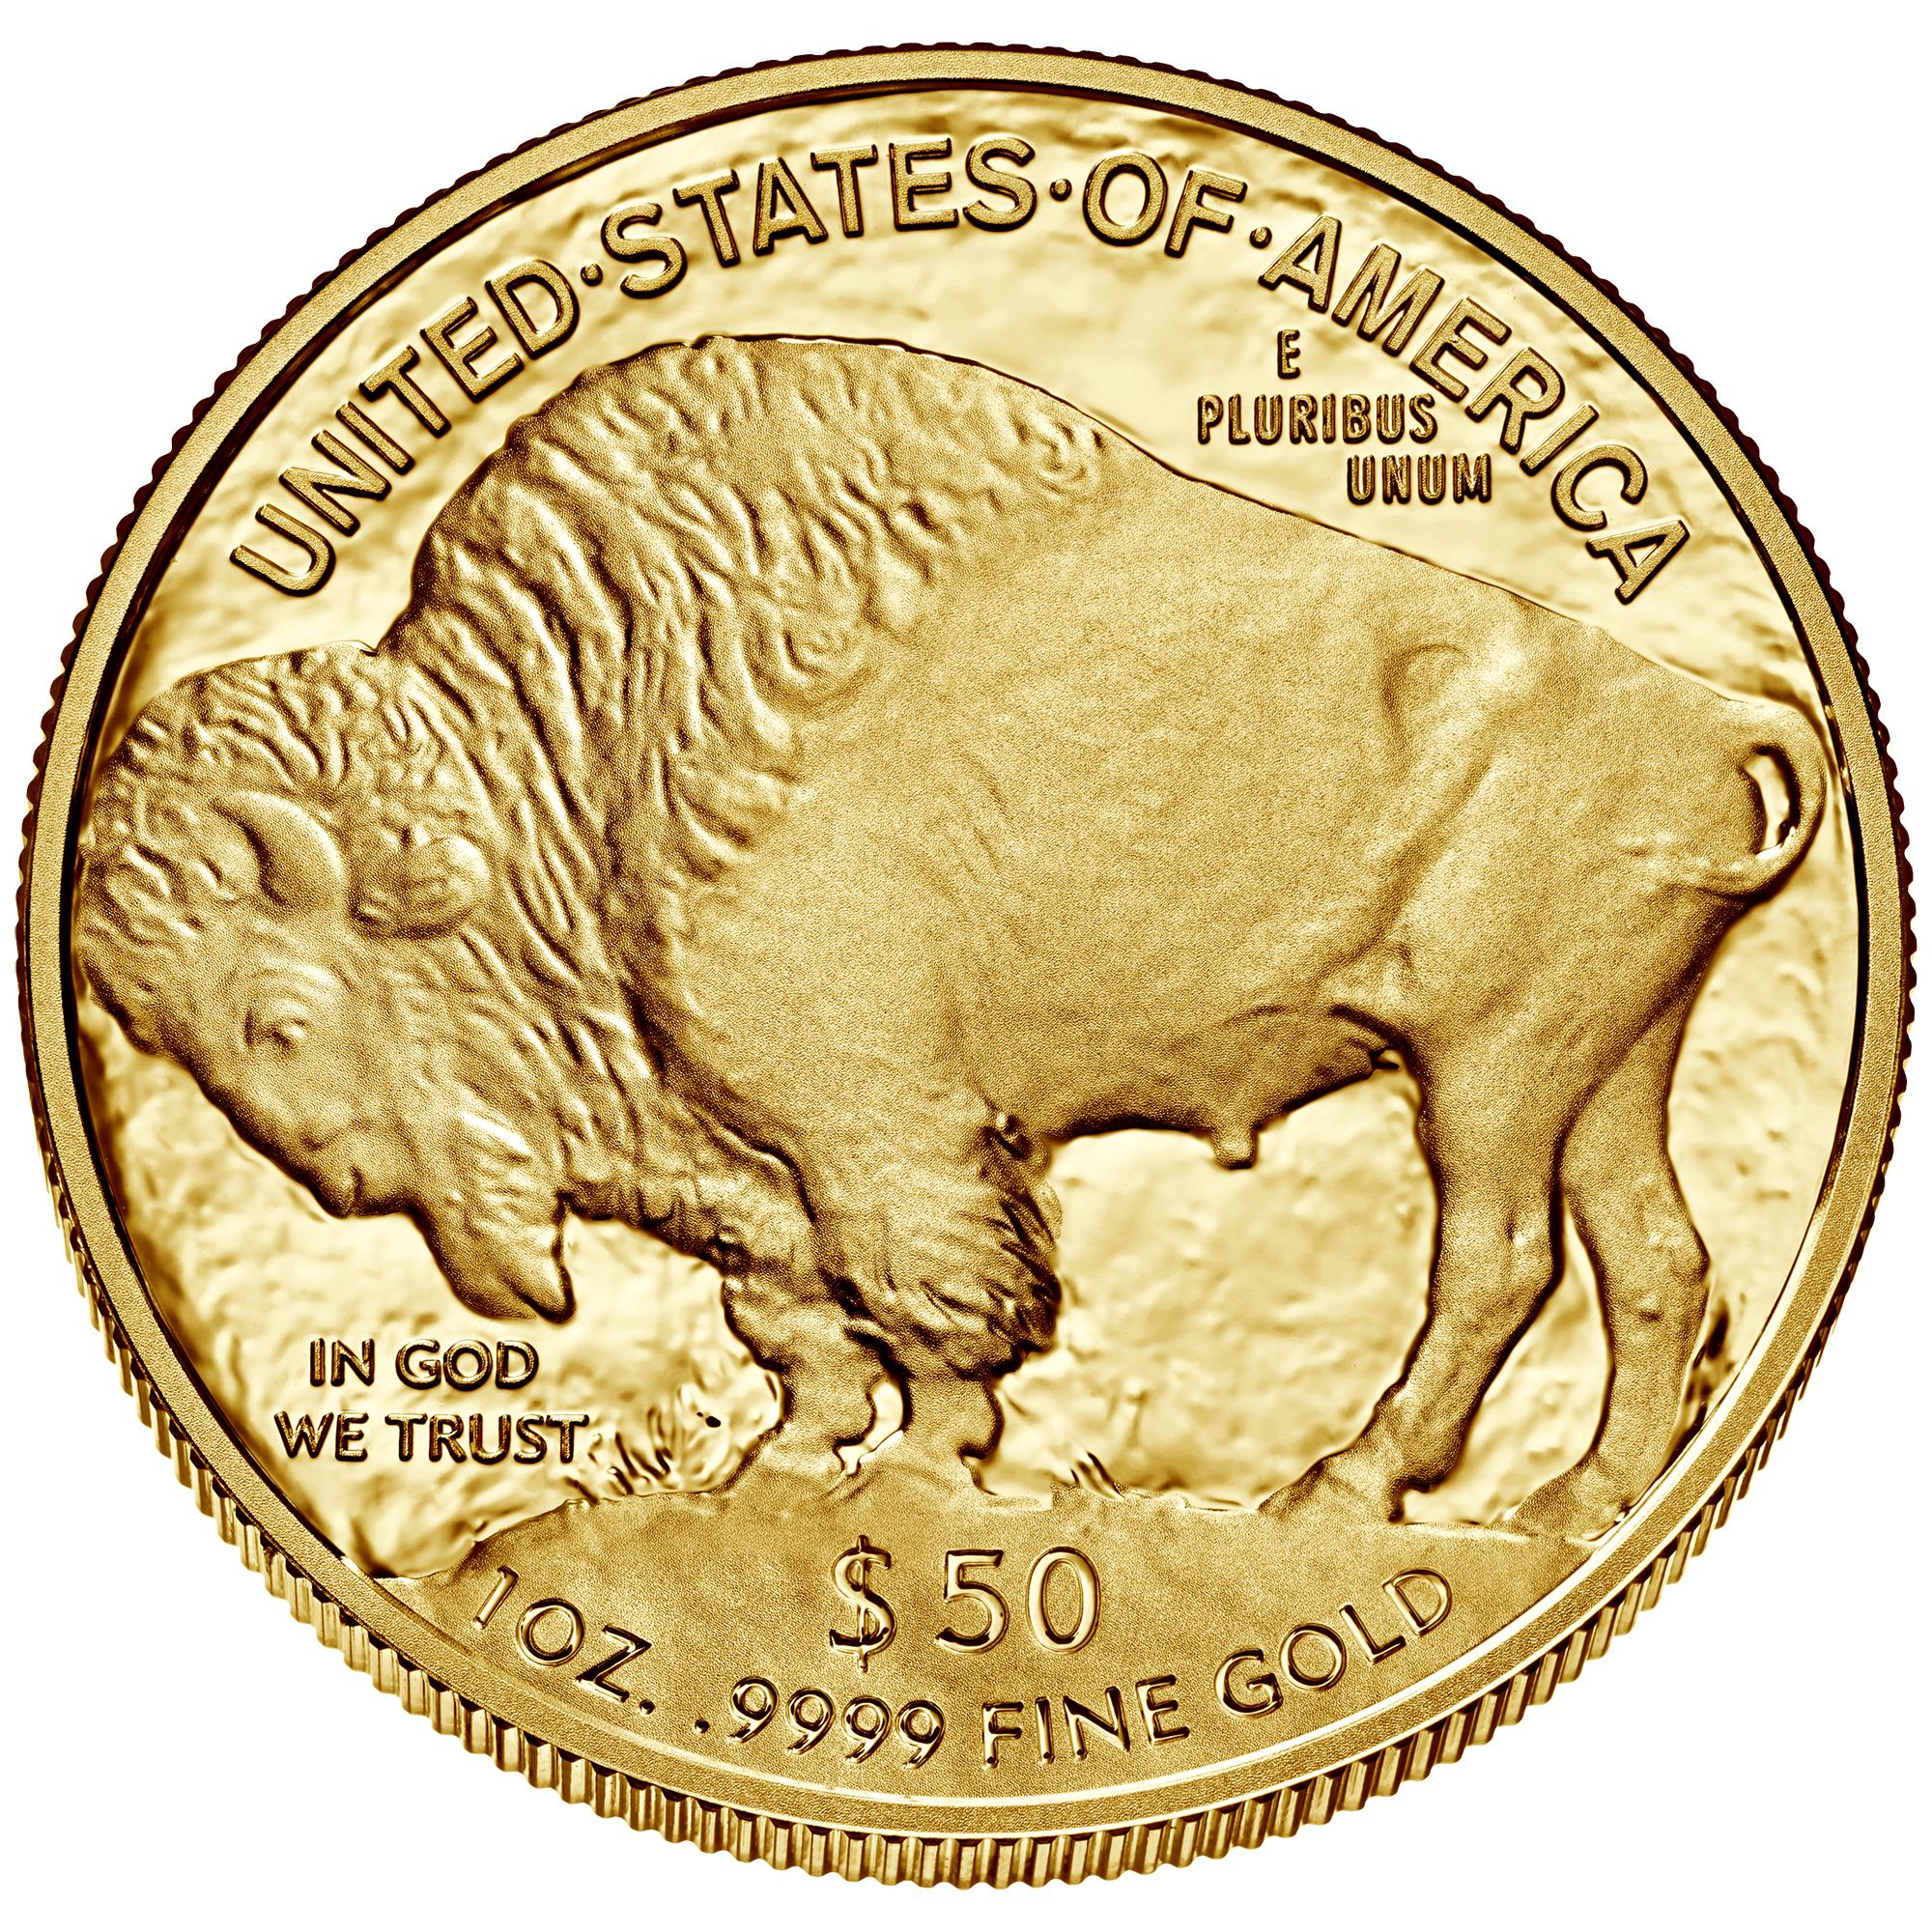 покрышки золотых монет американский бизон 1 унция билеты